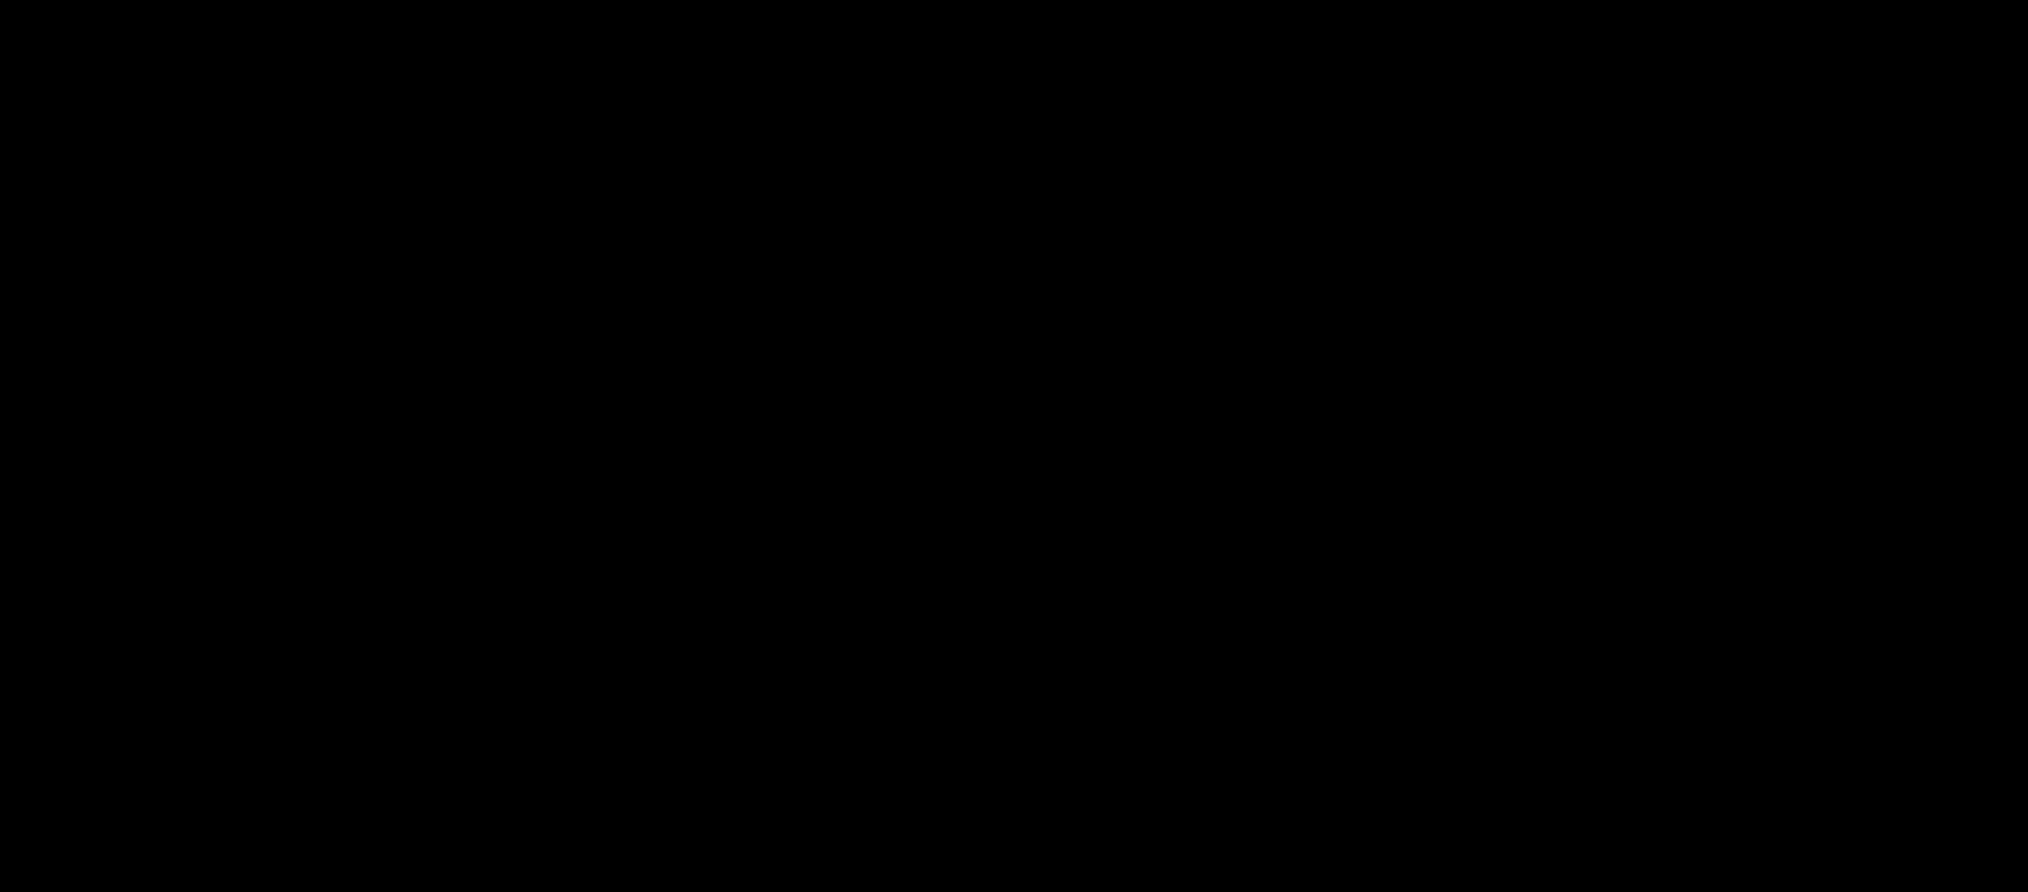 N-Biotinyl norepinephrine-d<sub>3</sub>